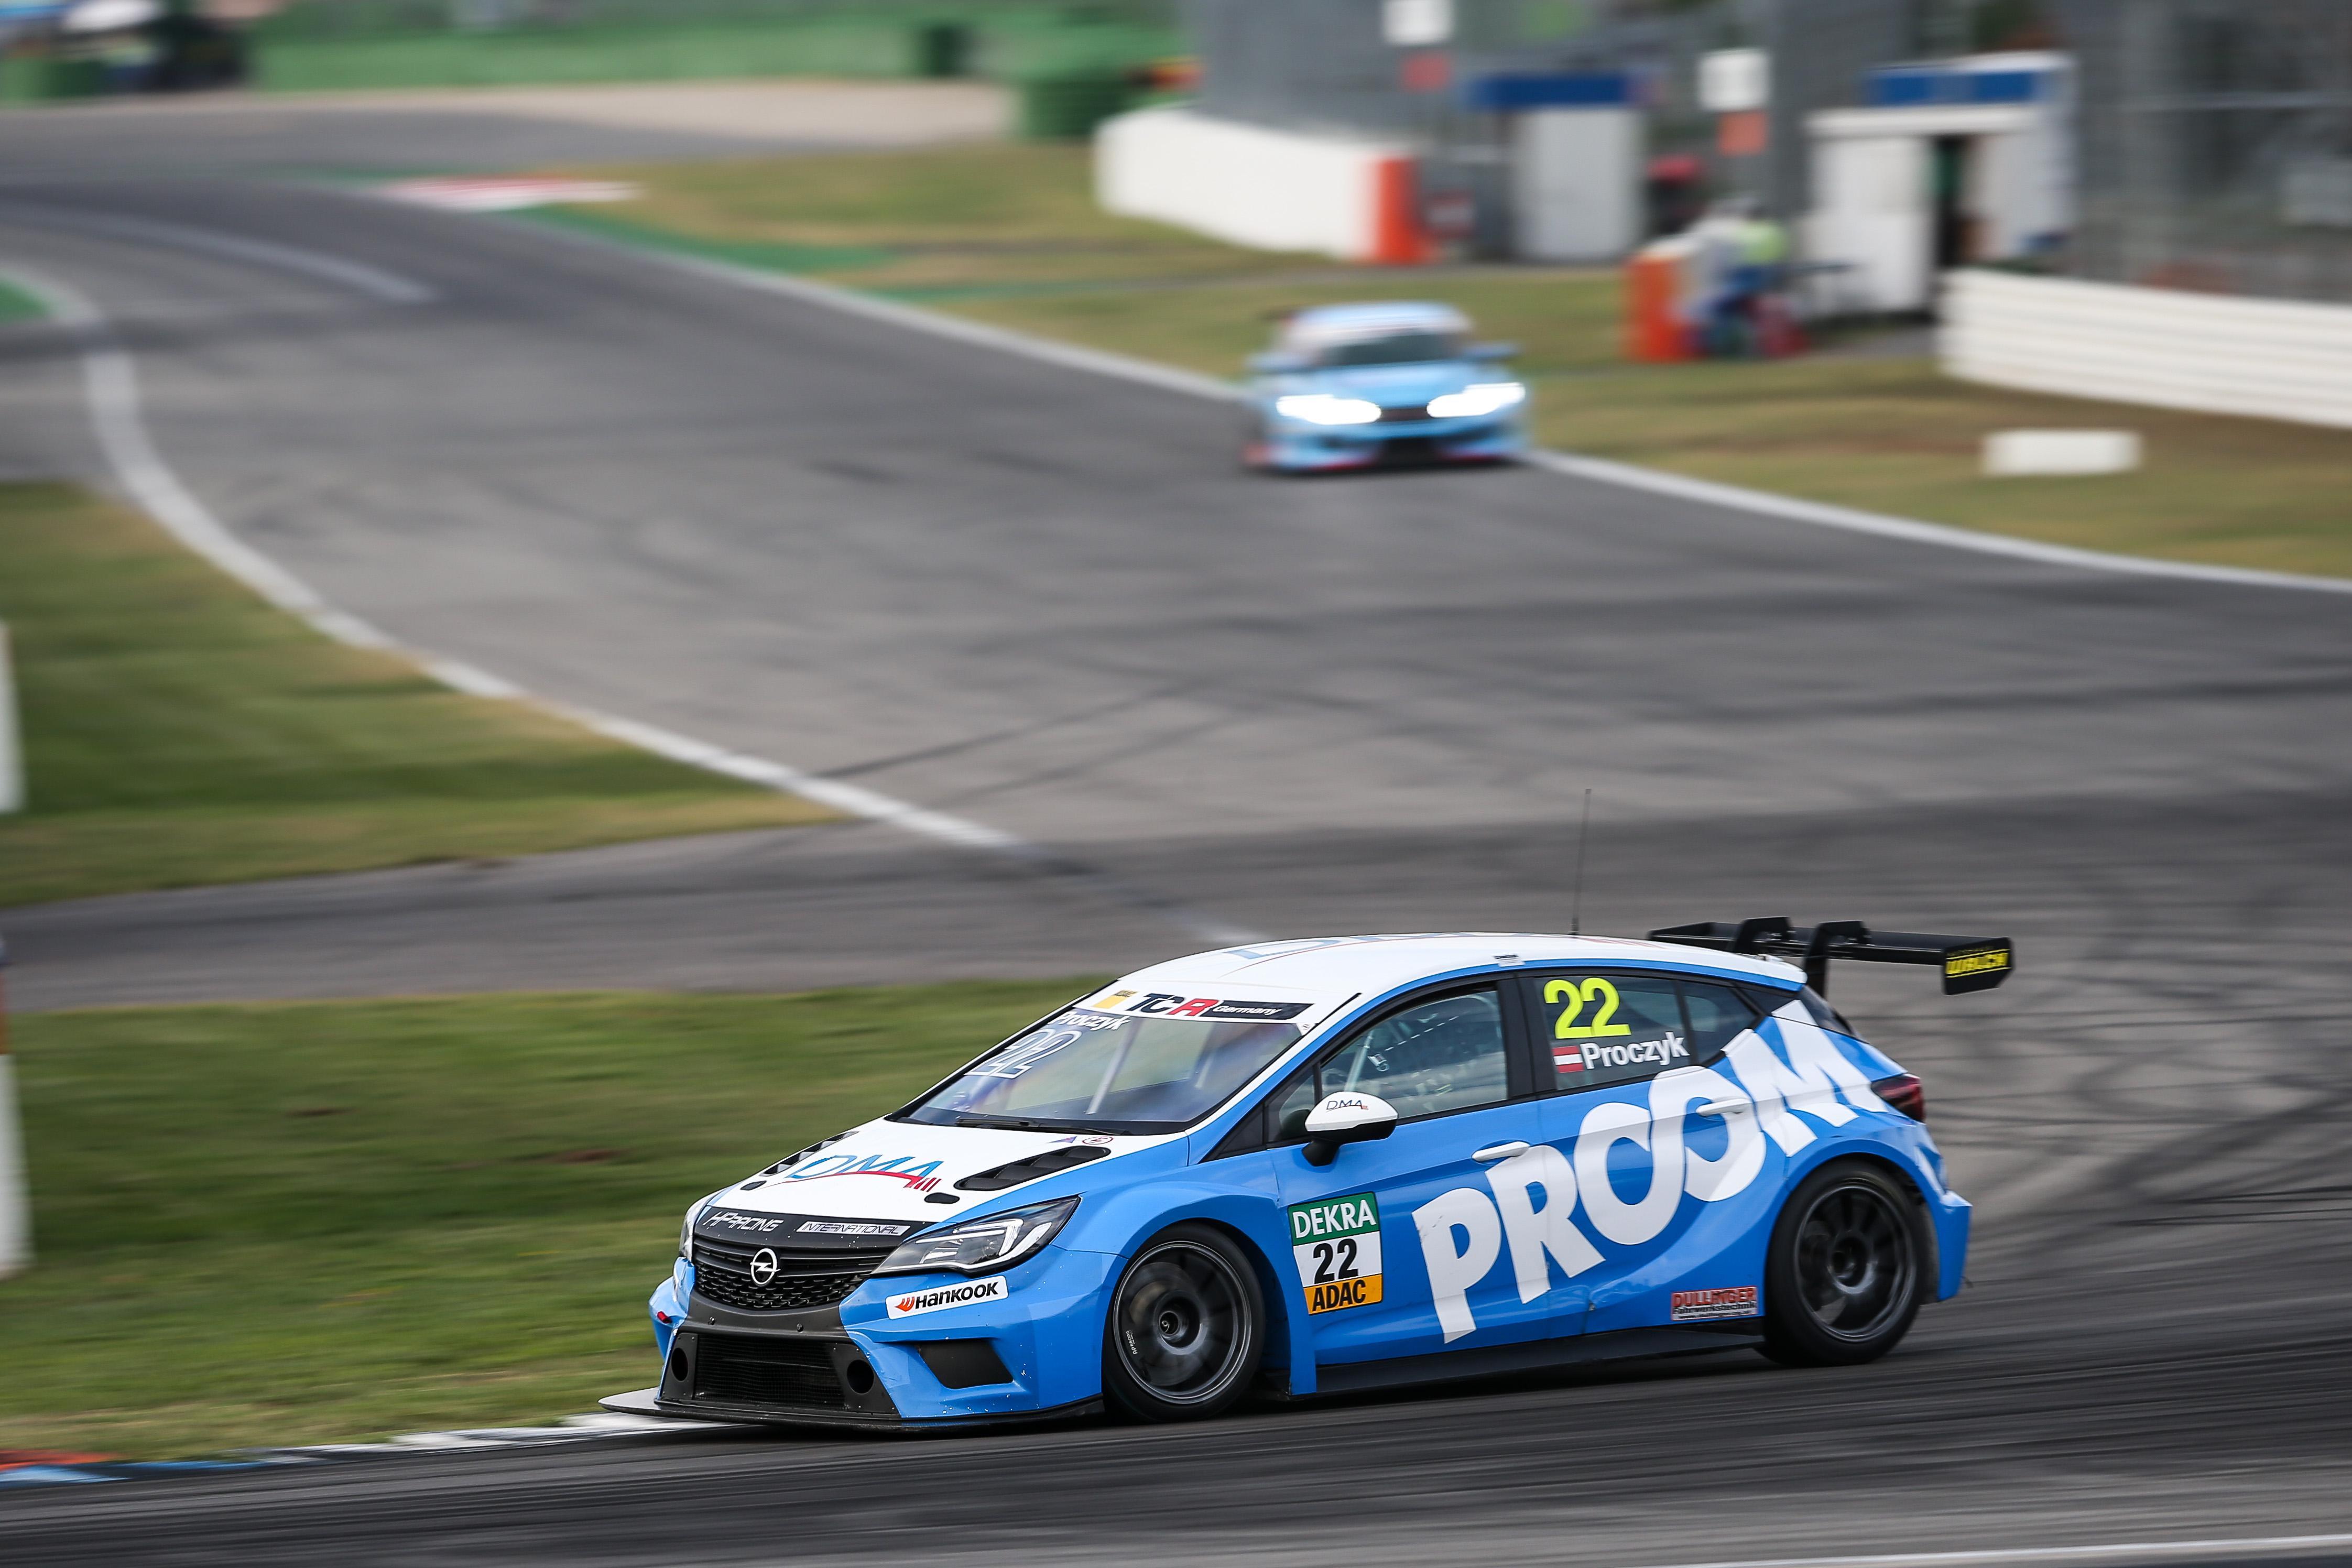 PROOM driver Hari Proczyk brings home the ADAC TCR Germany championship